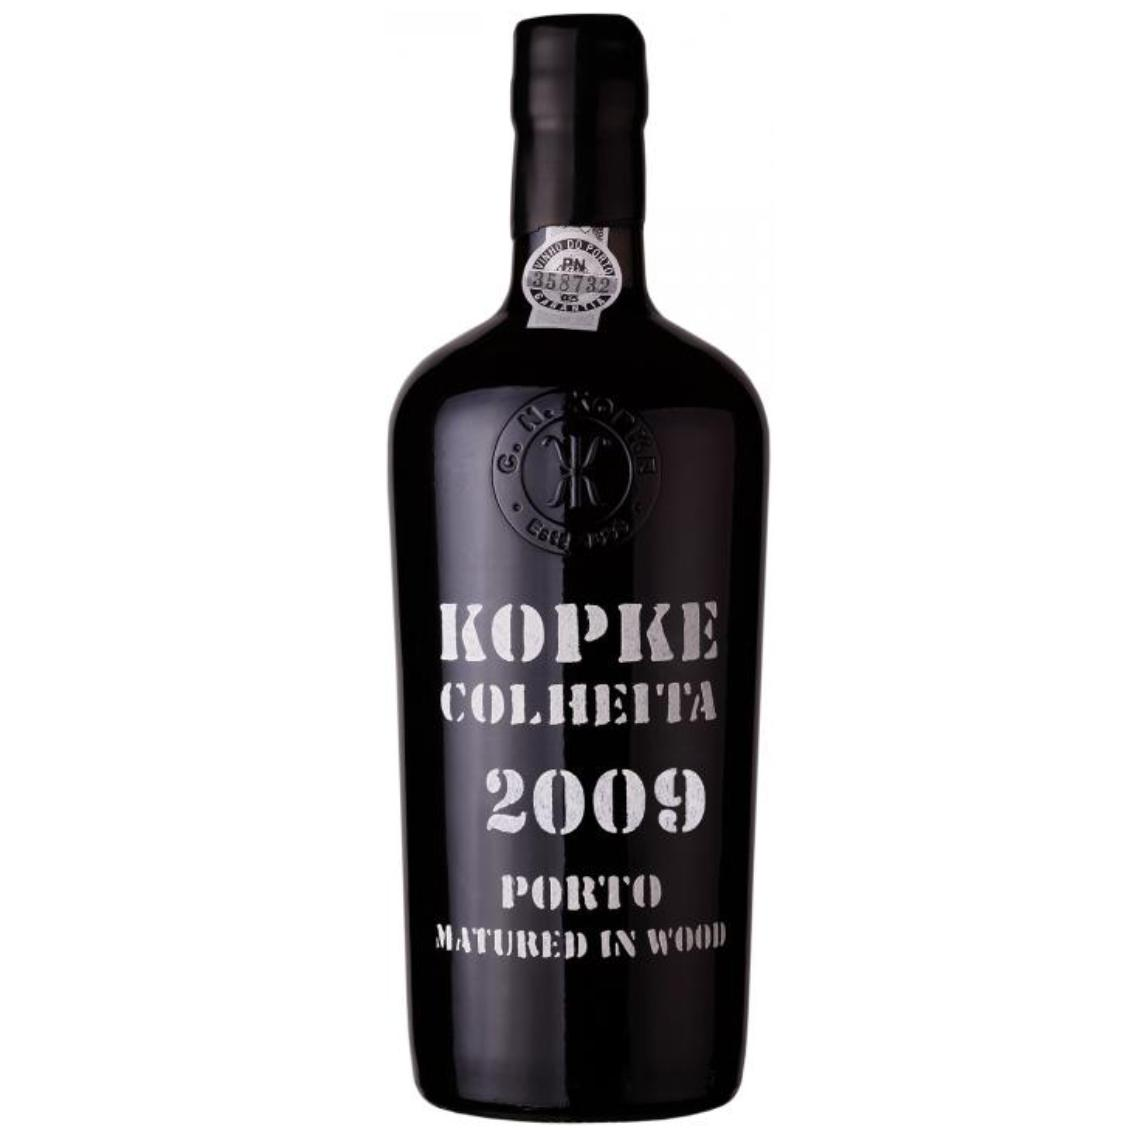 2009 Colheita Port - Kopke